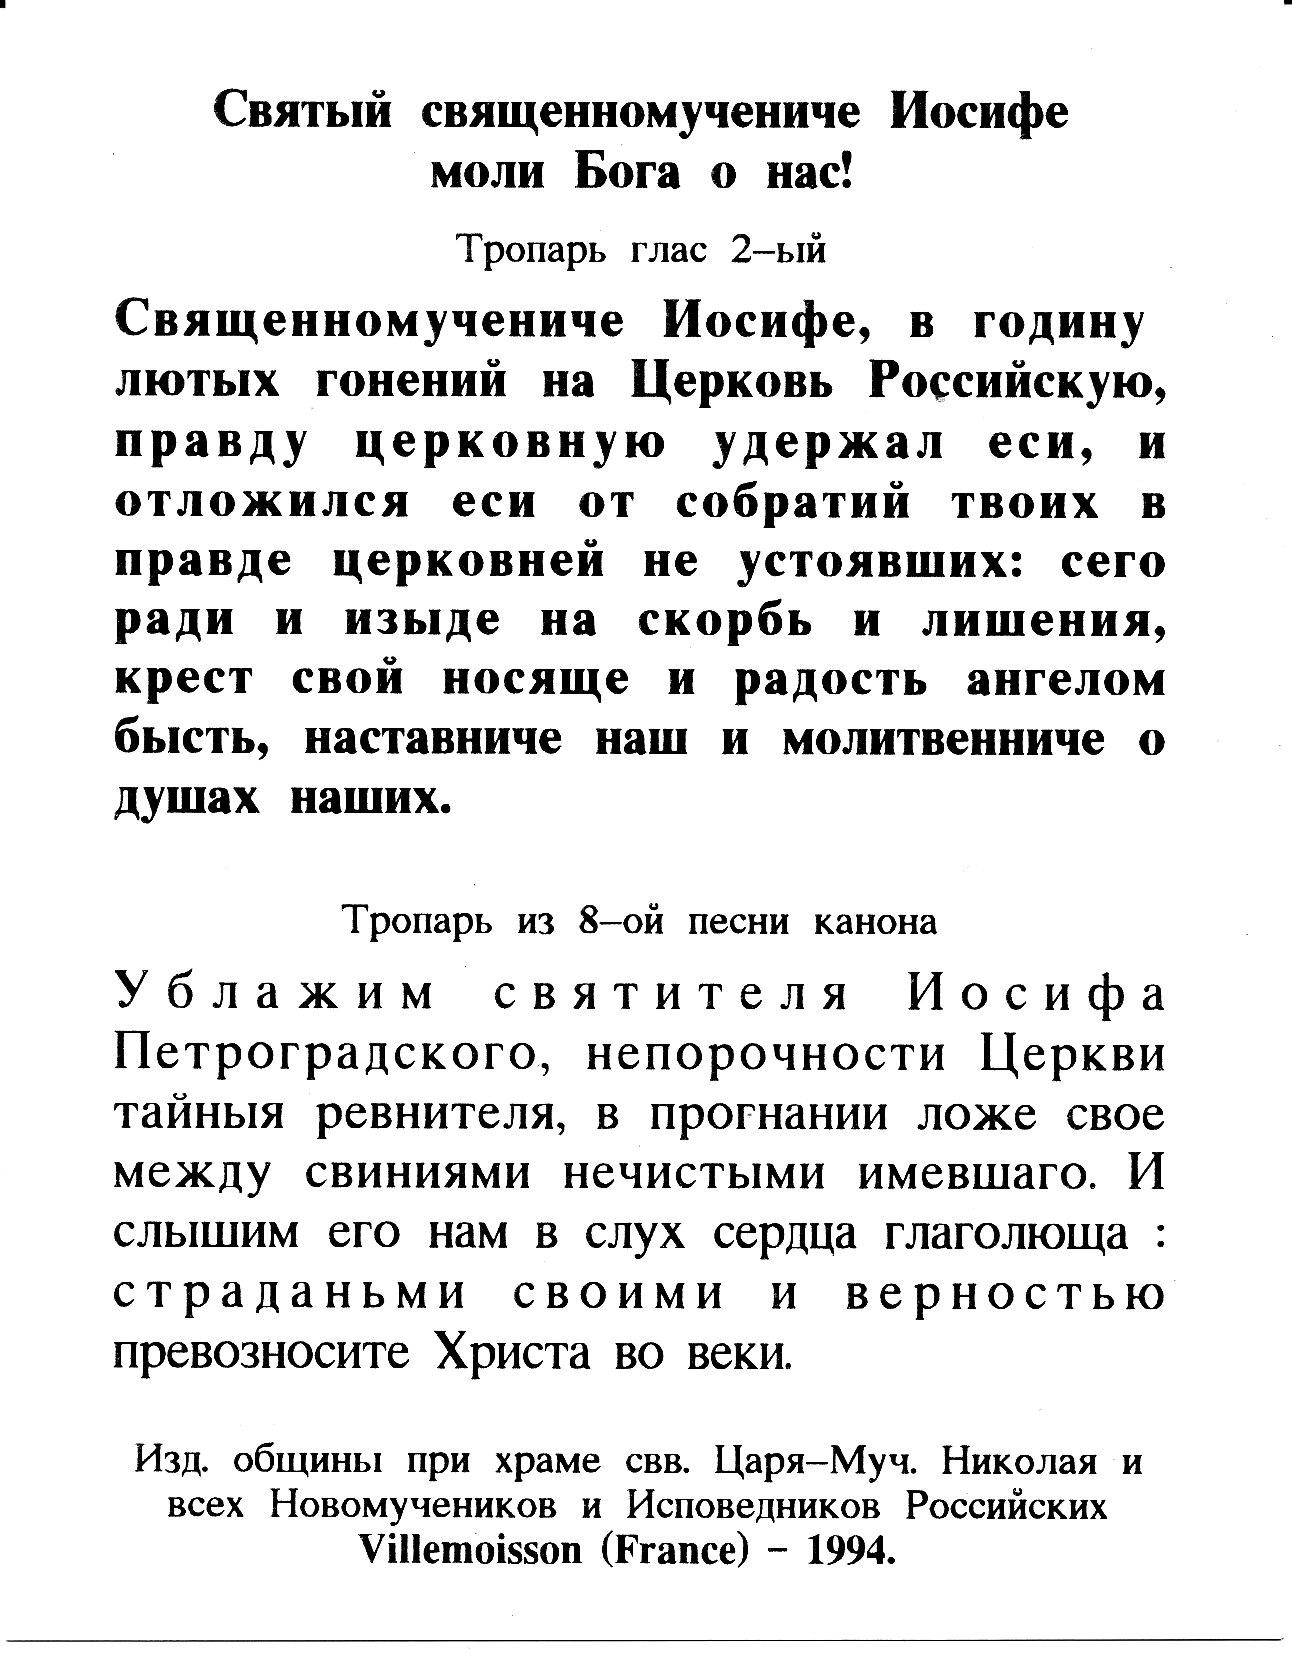 JOSEPH_Petrograd_Dos_0003